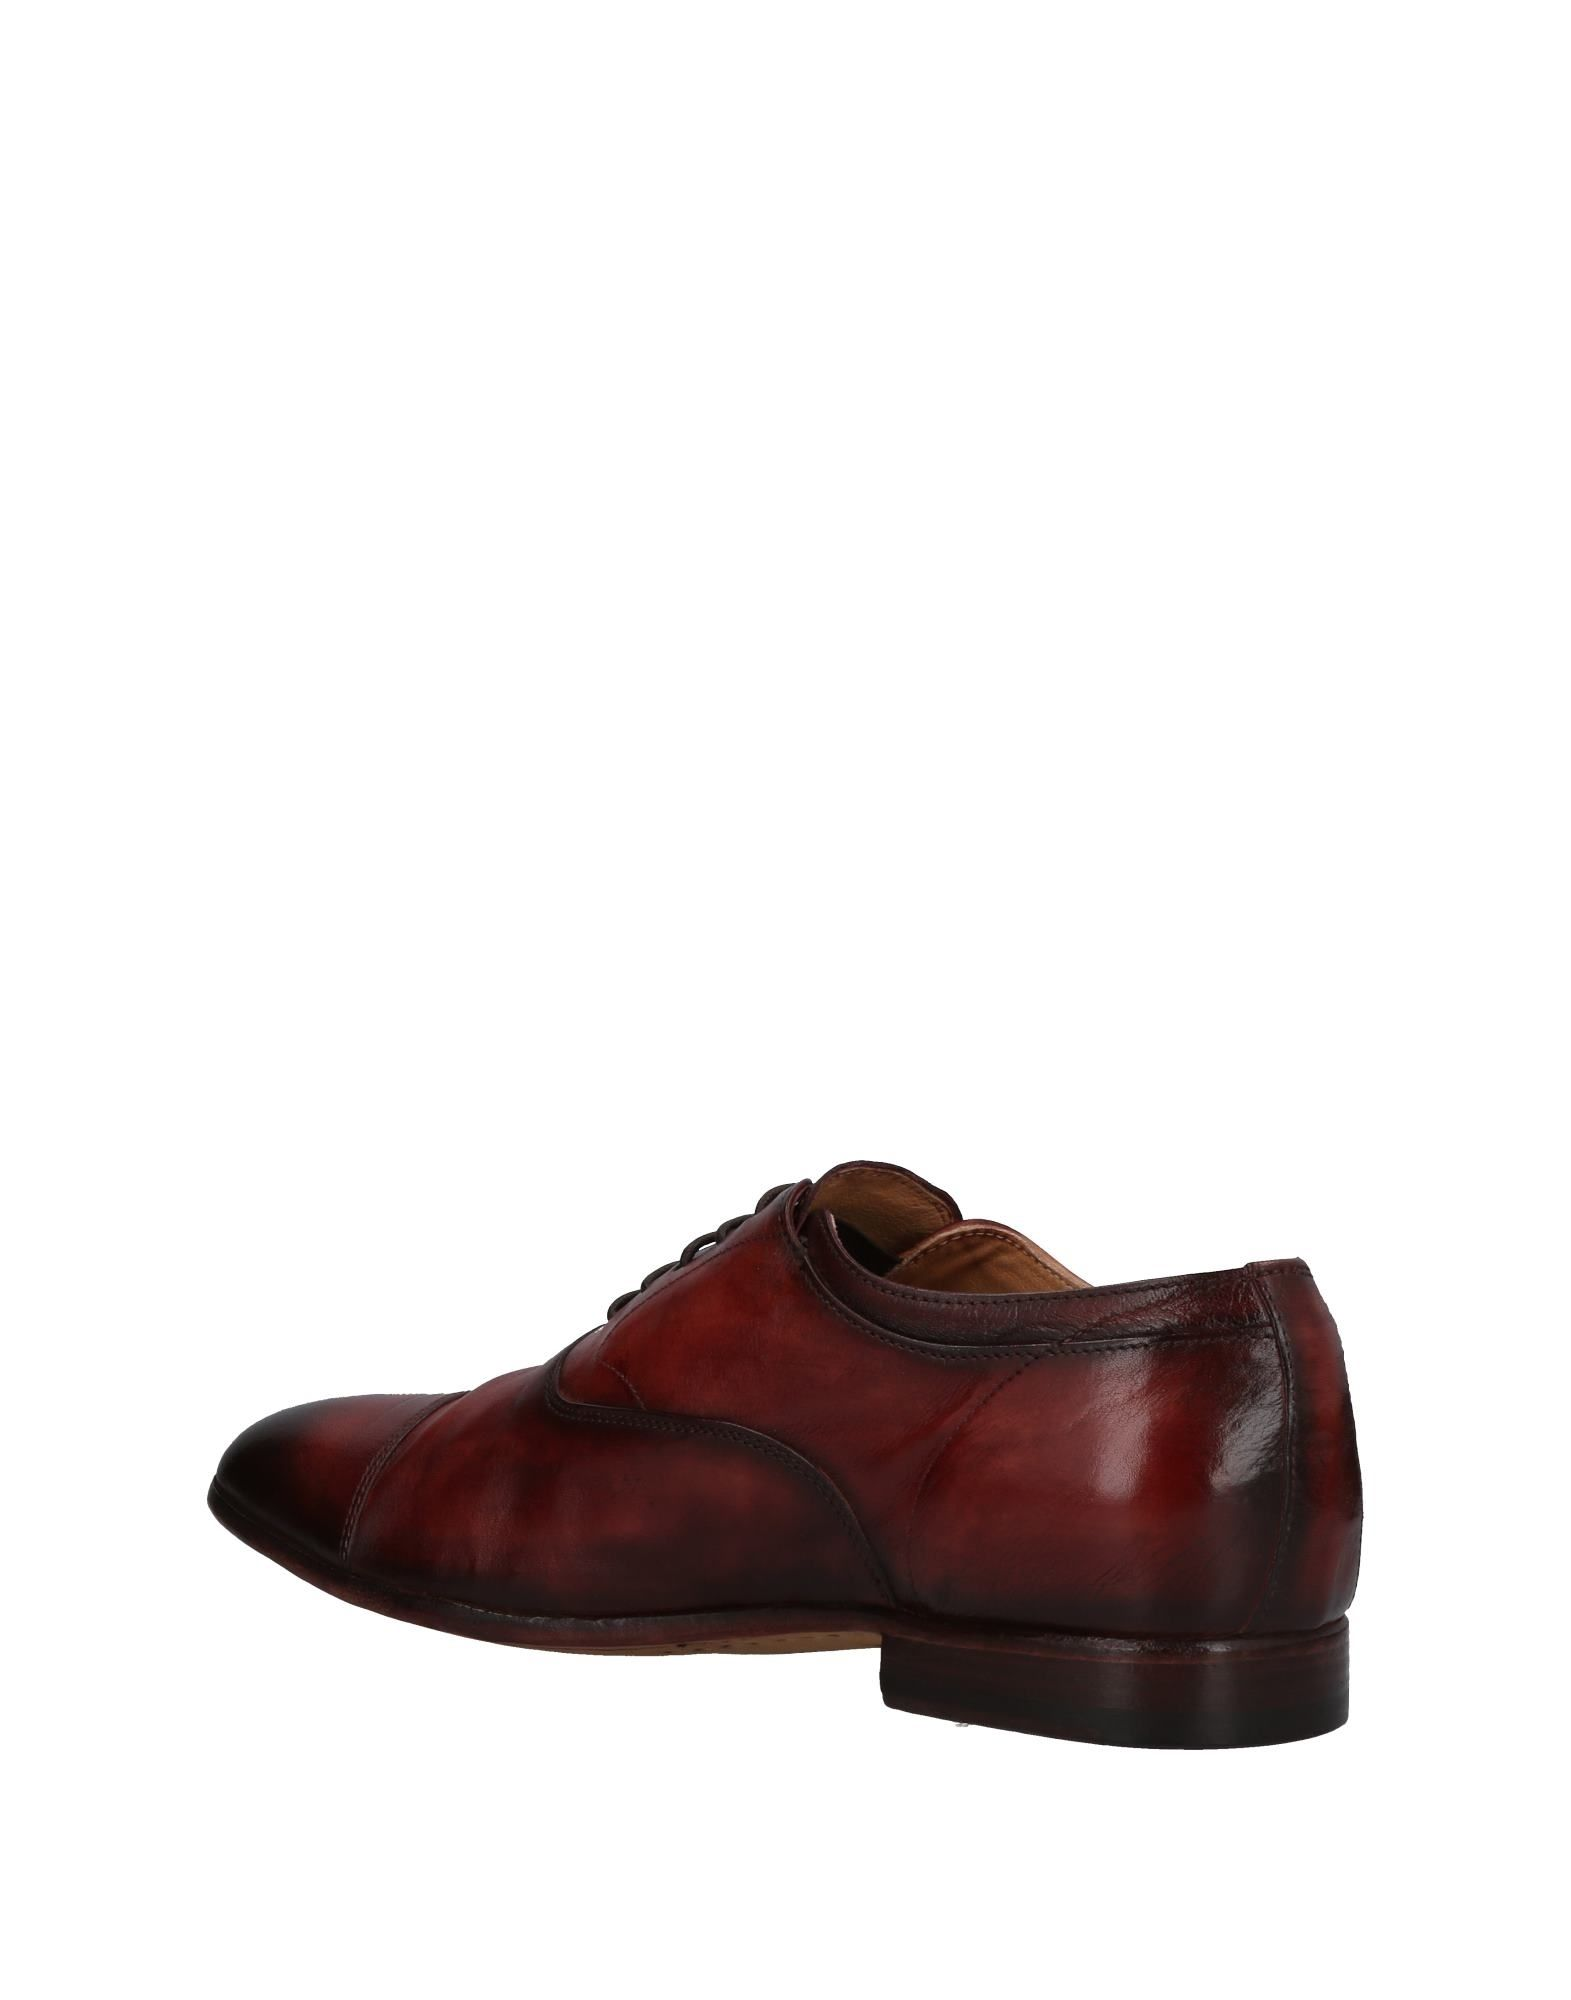 Officine Schuhe Creative Italia Schnürschuhe Herren  11445481OB Neue Schuhe Officine a684f4